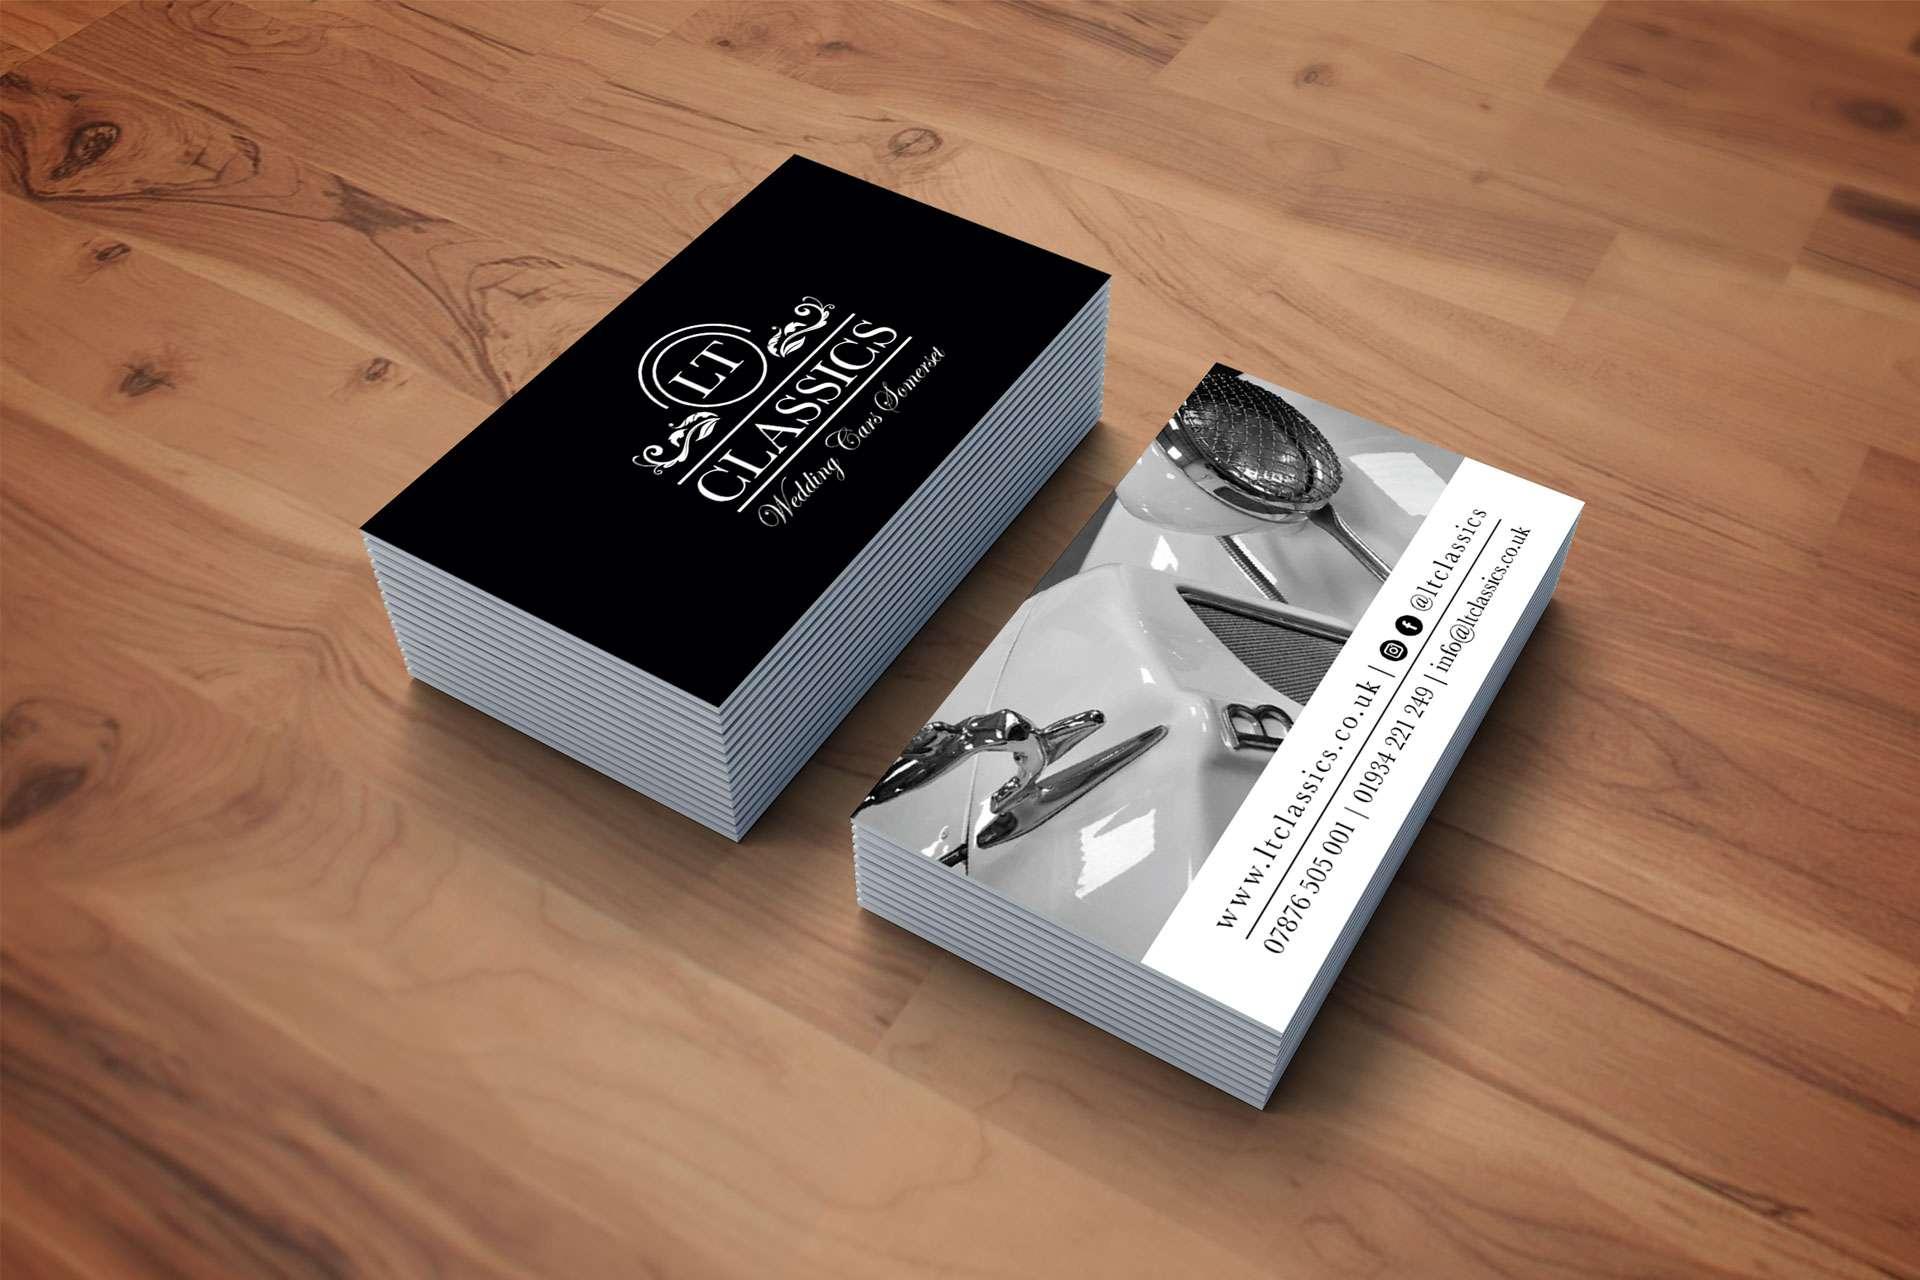 LT Classics - Wedding Cars Somerset Business Card Design